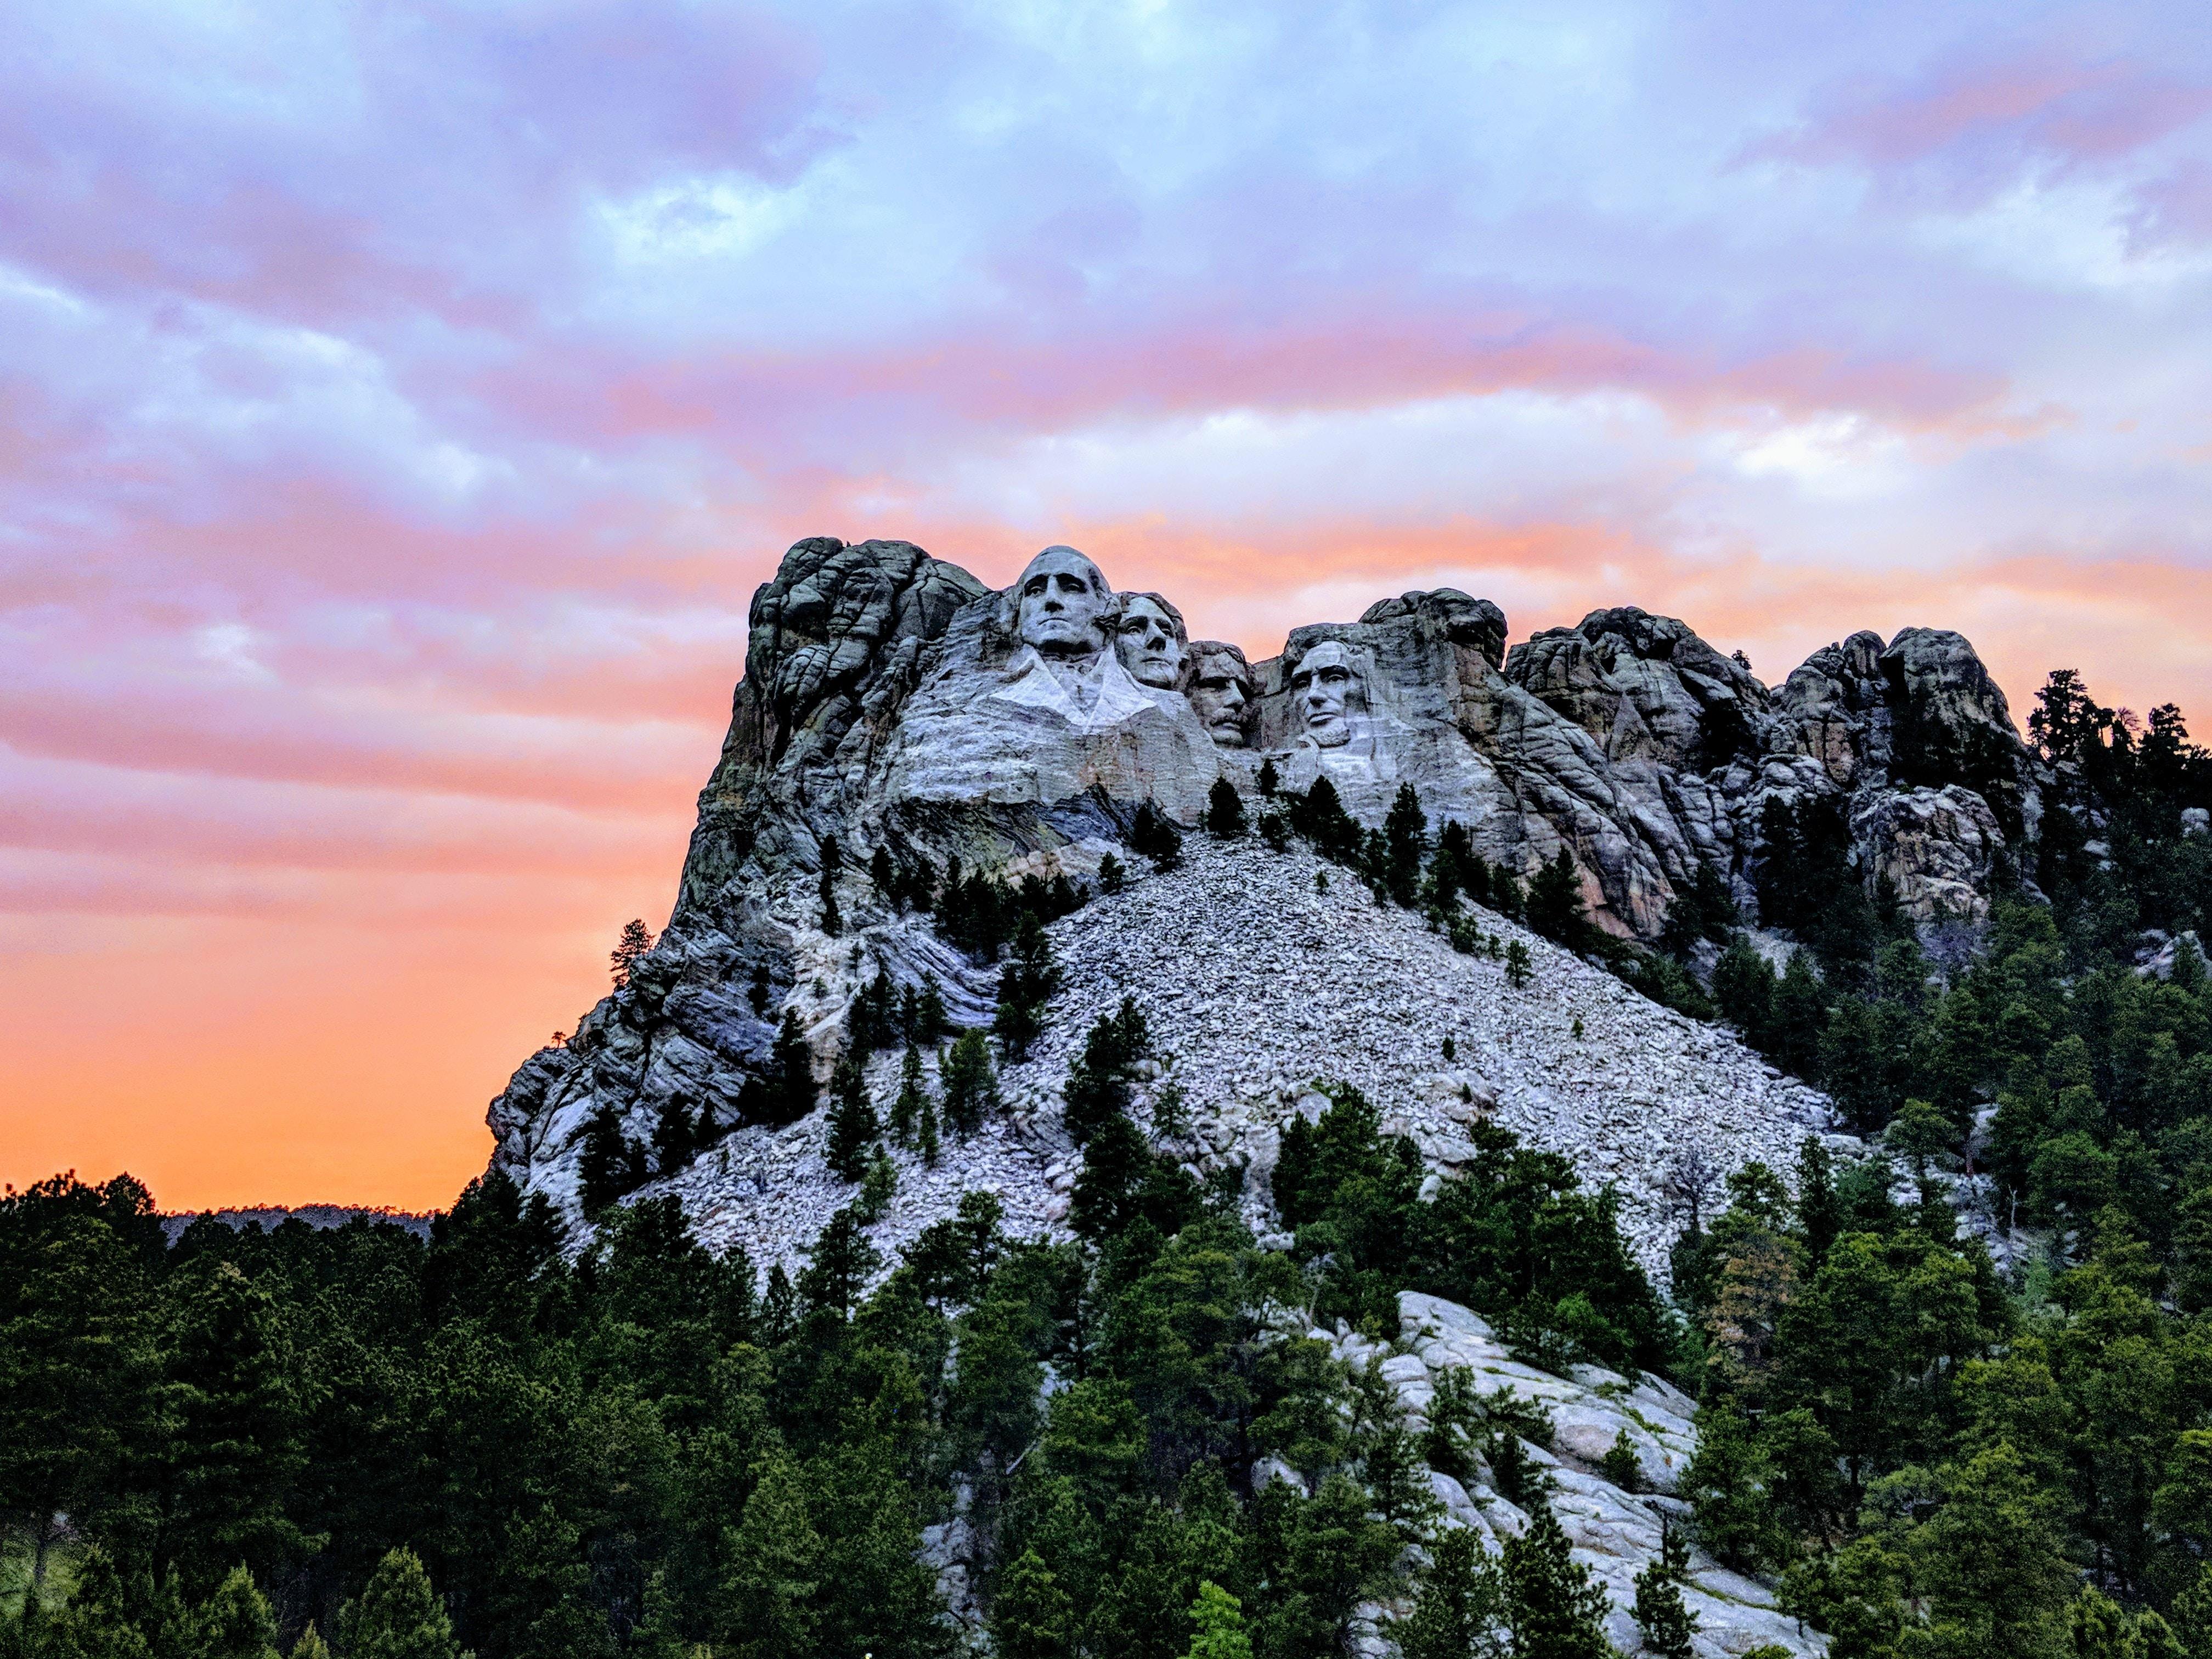 Mount Rushmore National Park, South Dakota, U.S.A during daytime